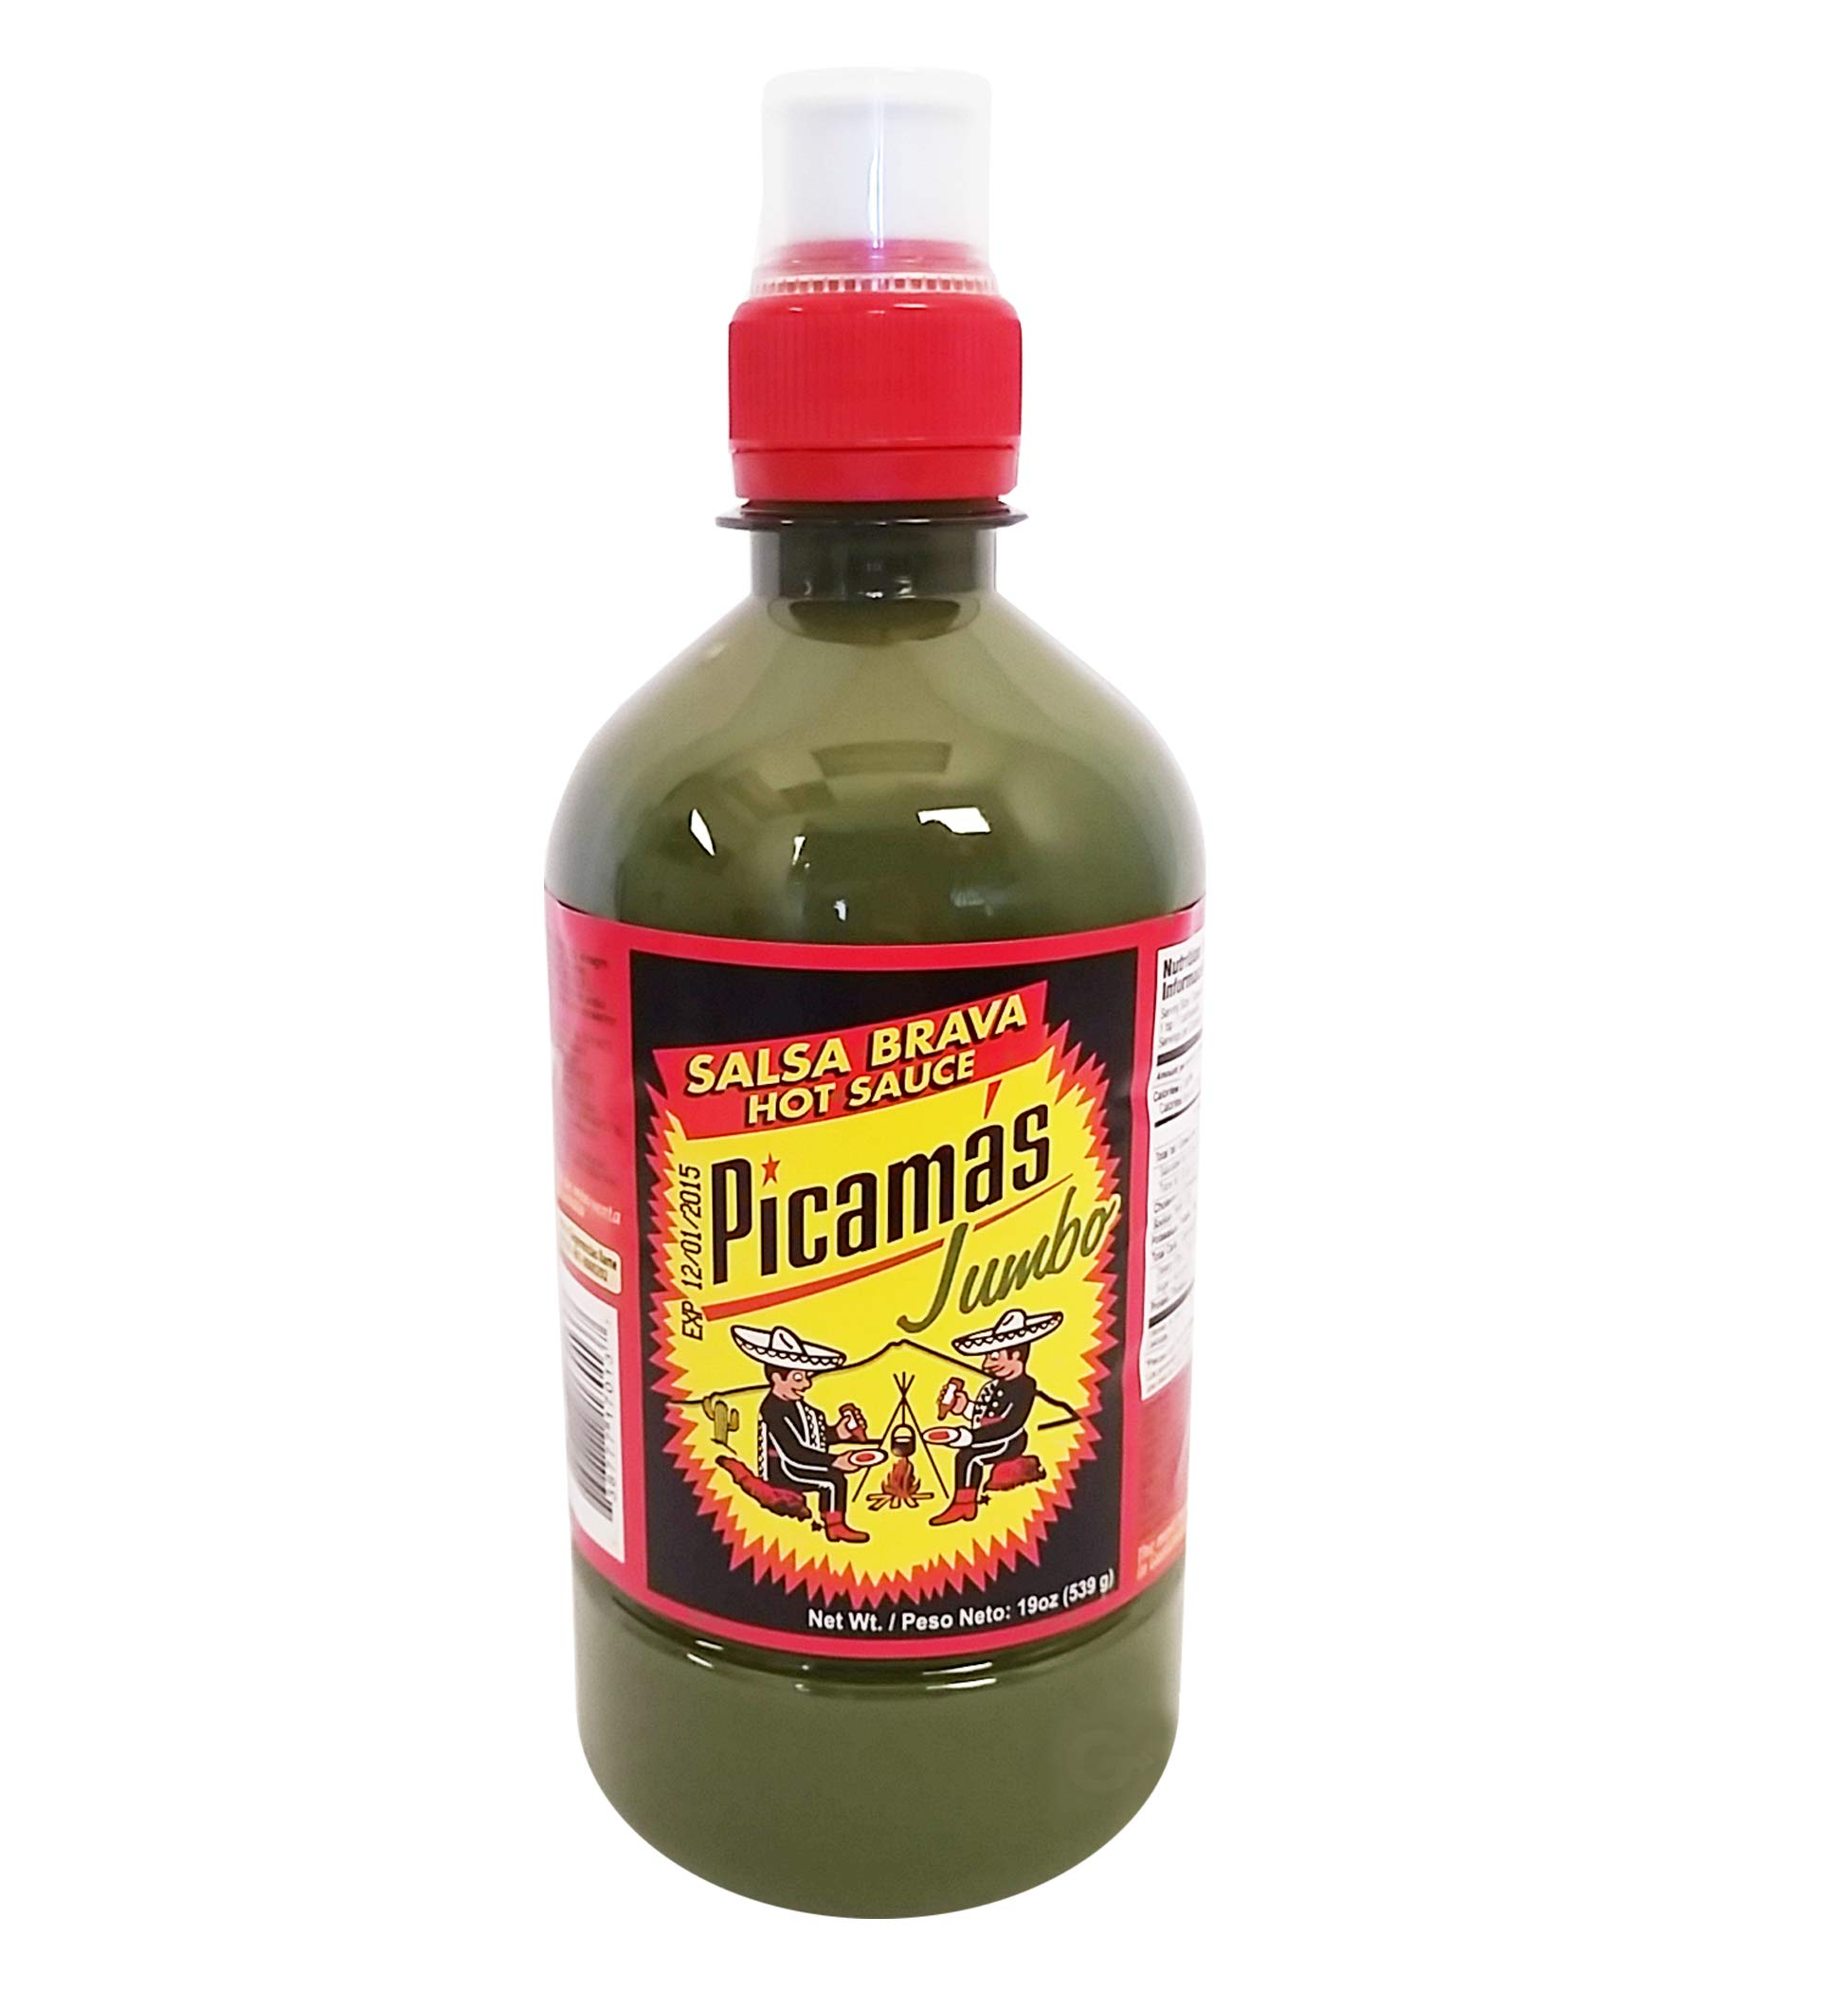 Picamas Hot Sauce Jumbo 19oz (Pack of 2 Bottles)